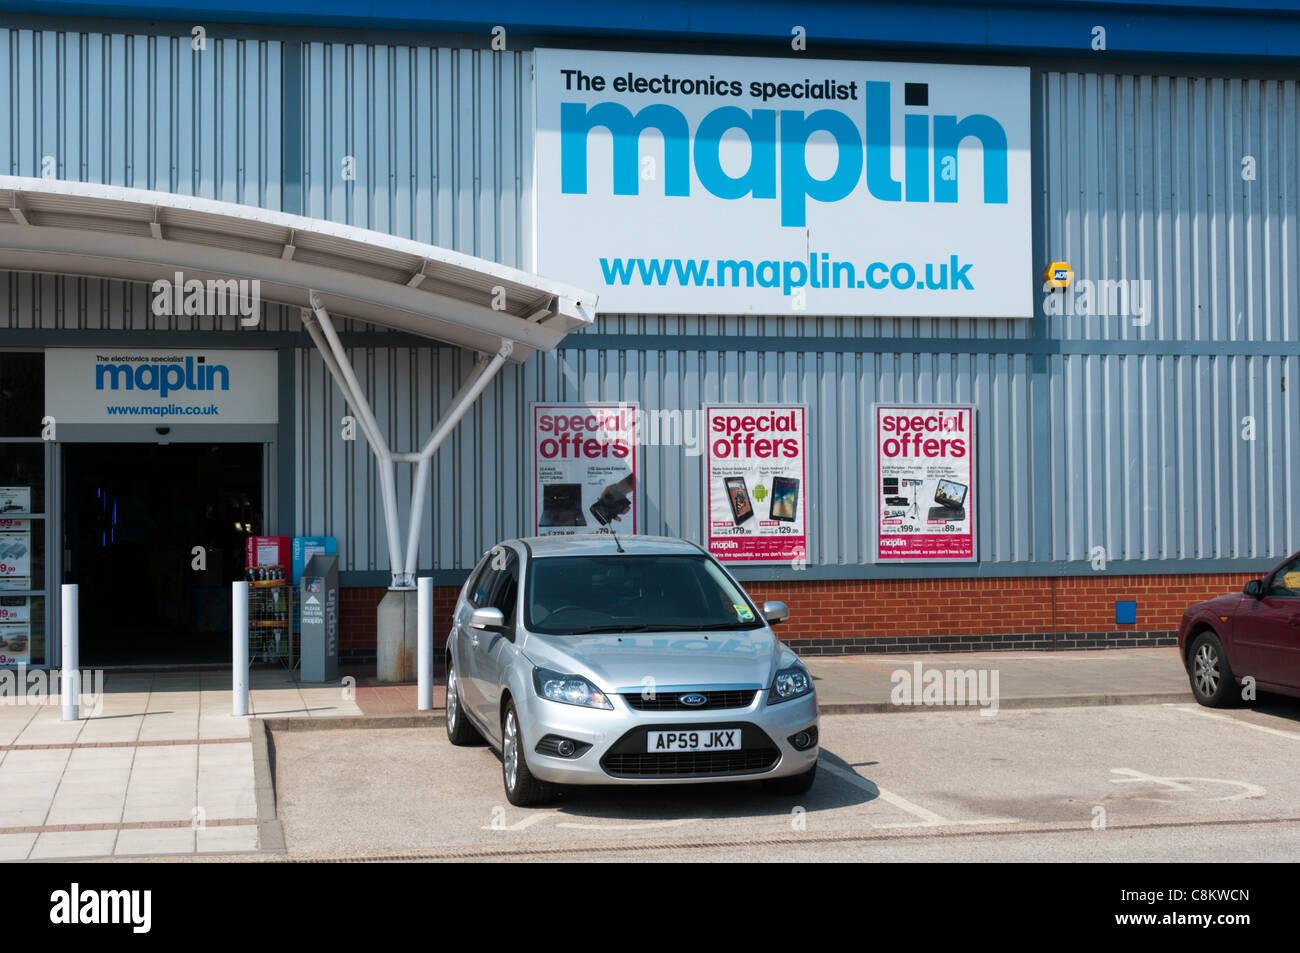 The Maplin electronics warehouse on the Hardwick Road Estate, King's Lynn, Norfolk, England - Stock Image